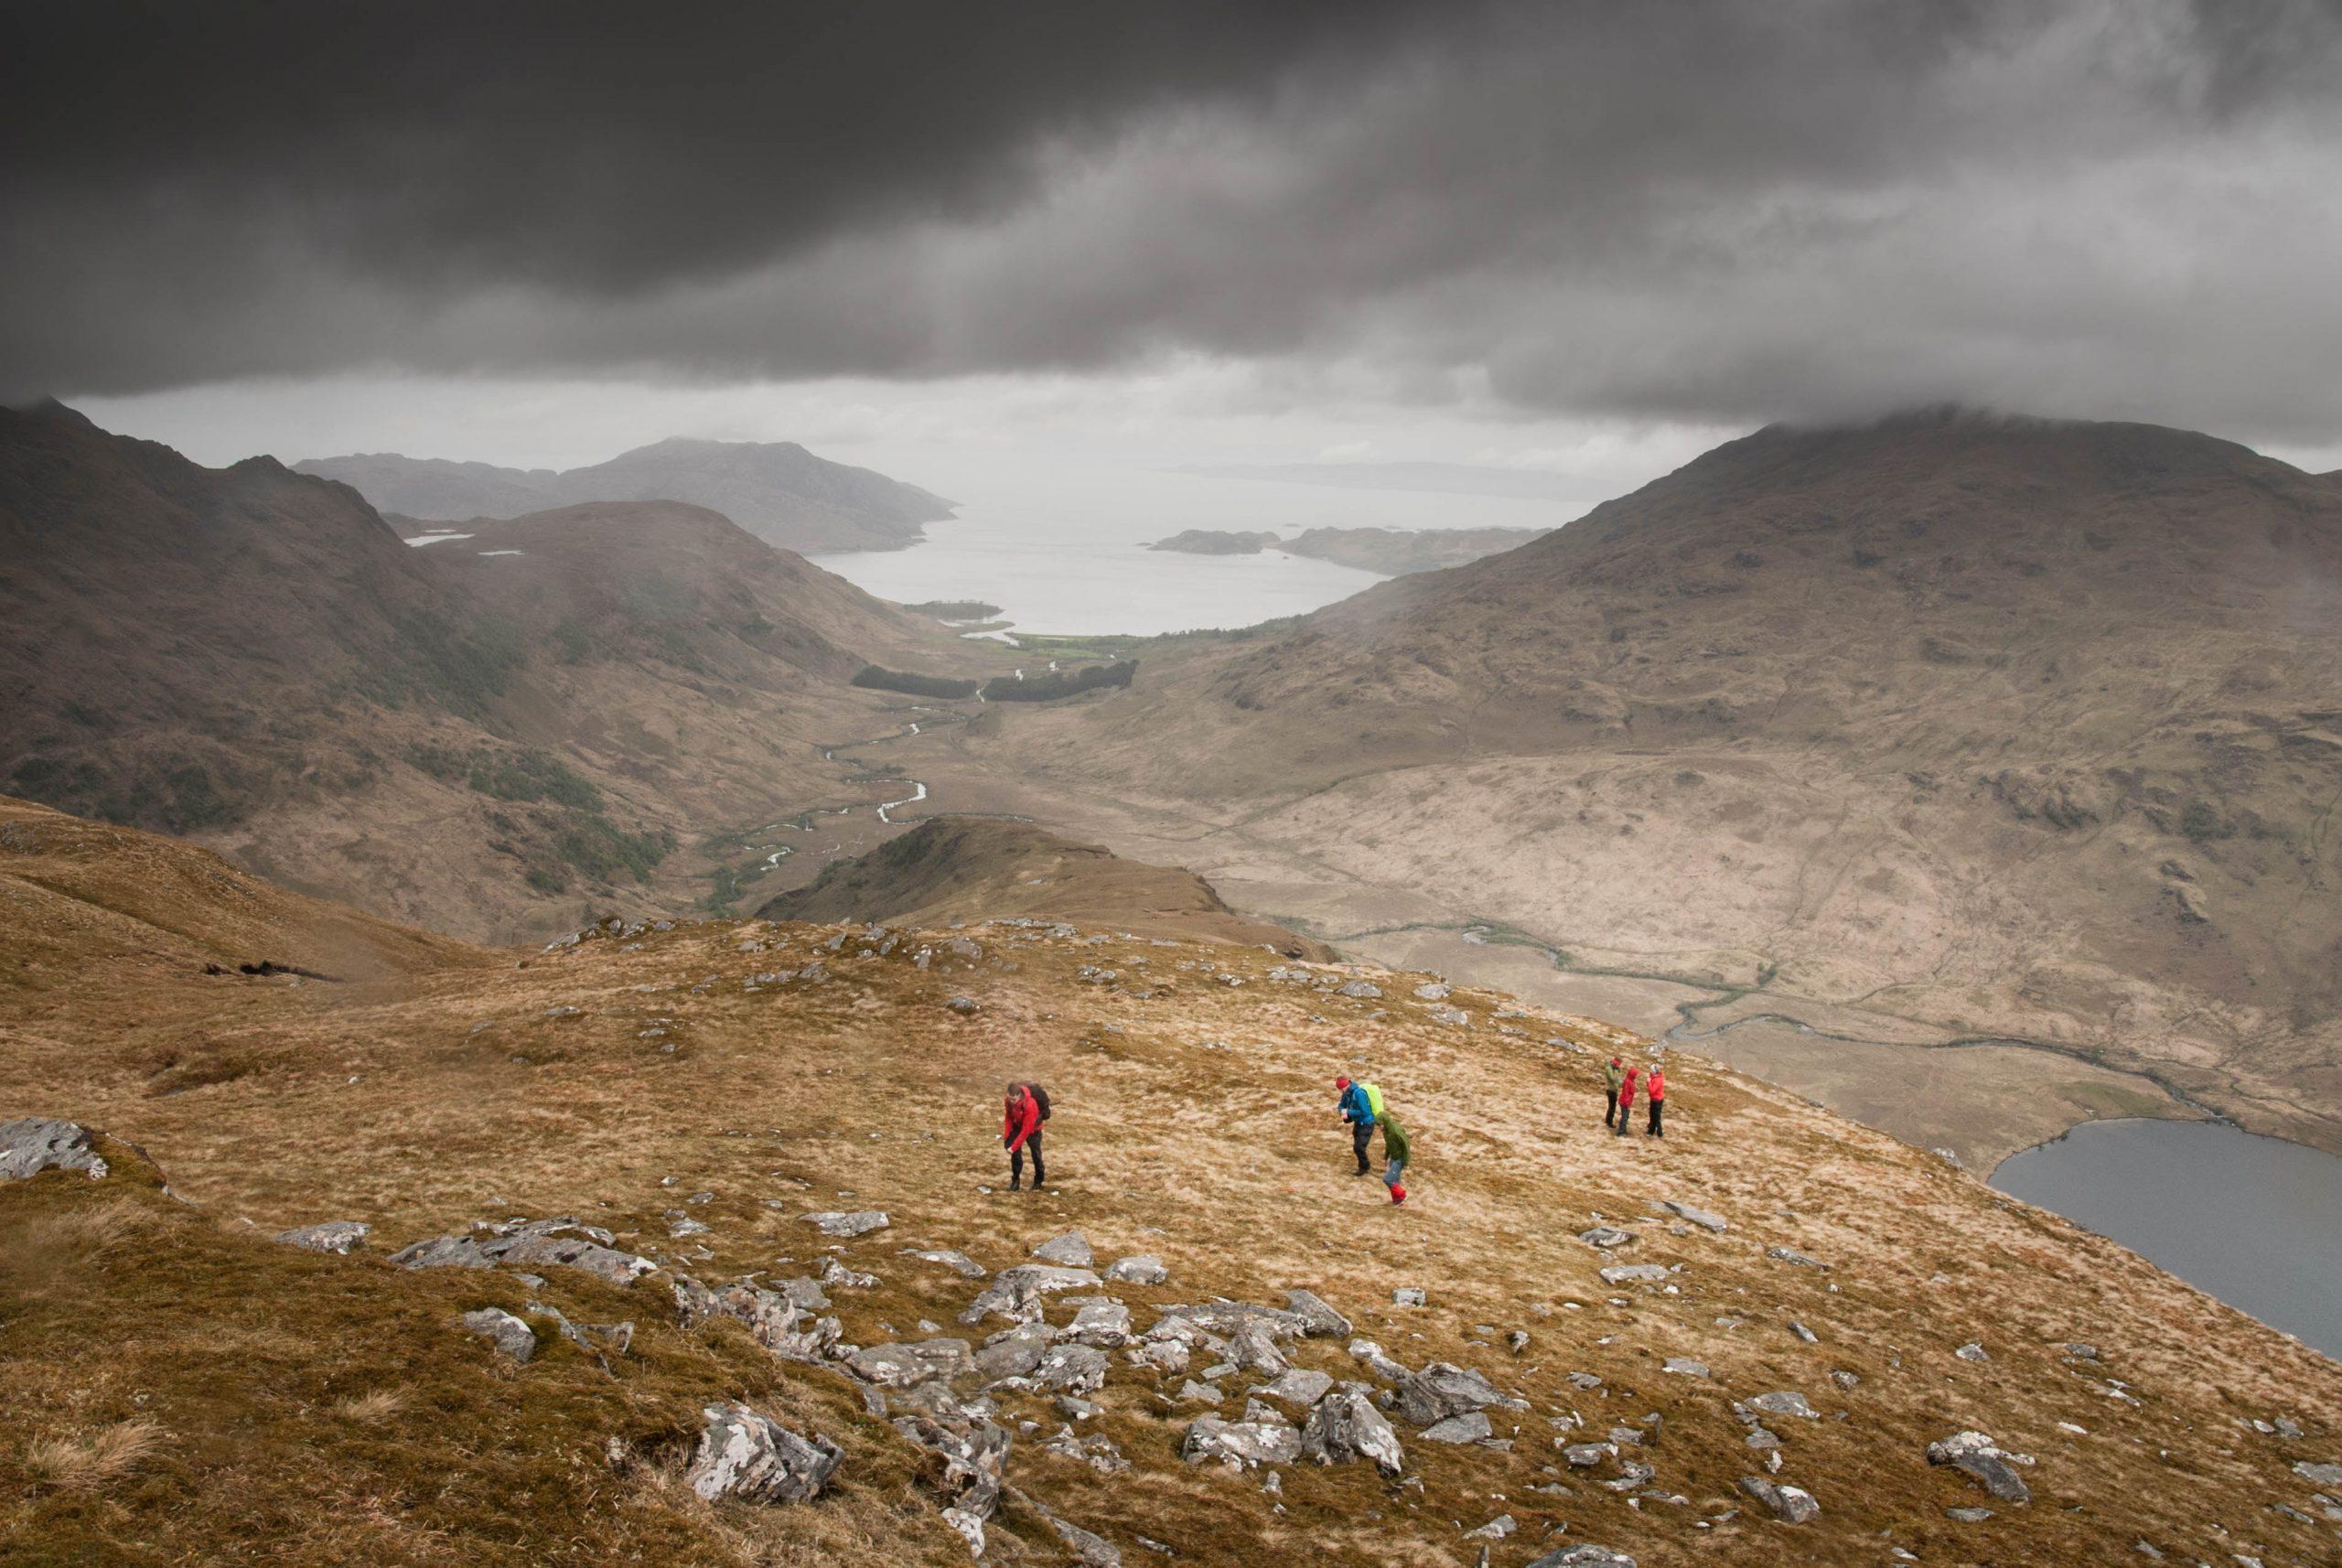 backpackers on mountain peak